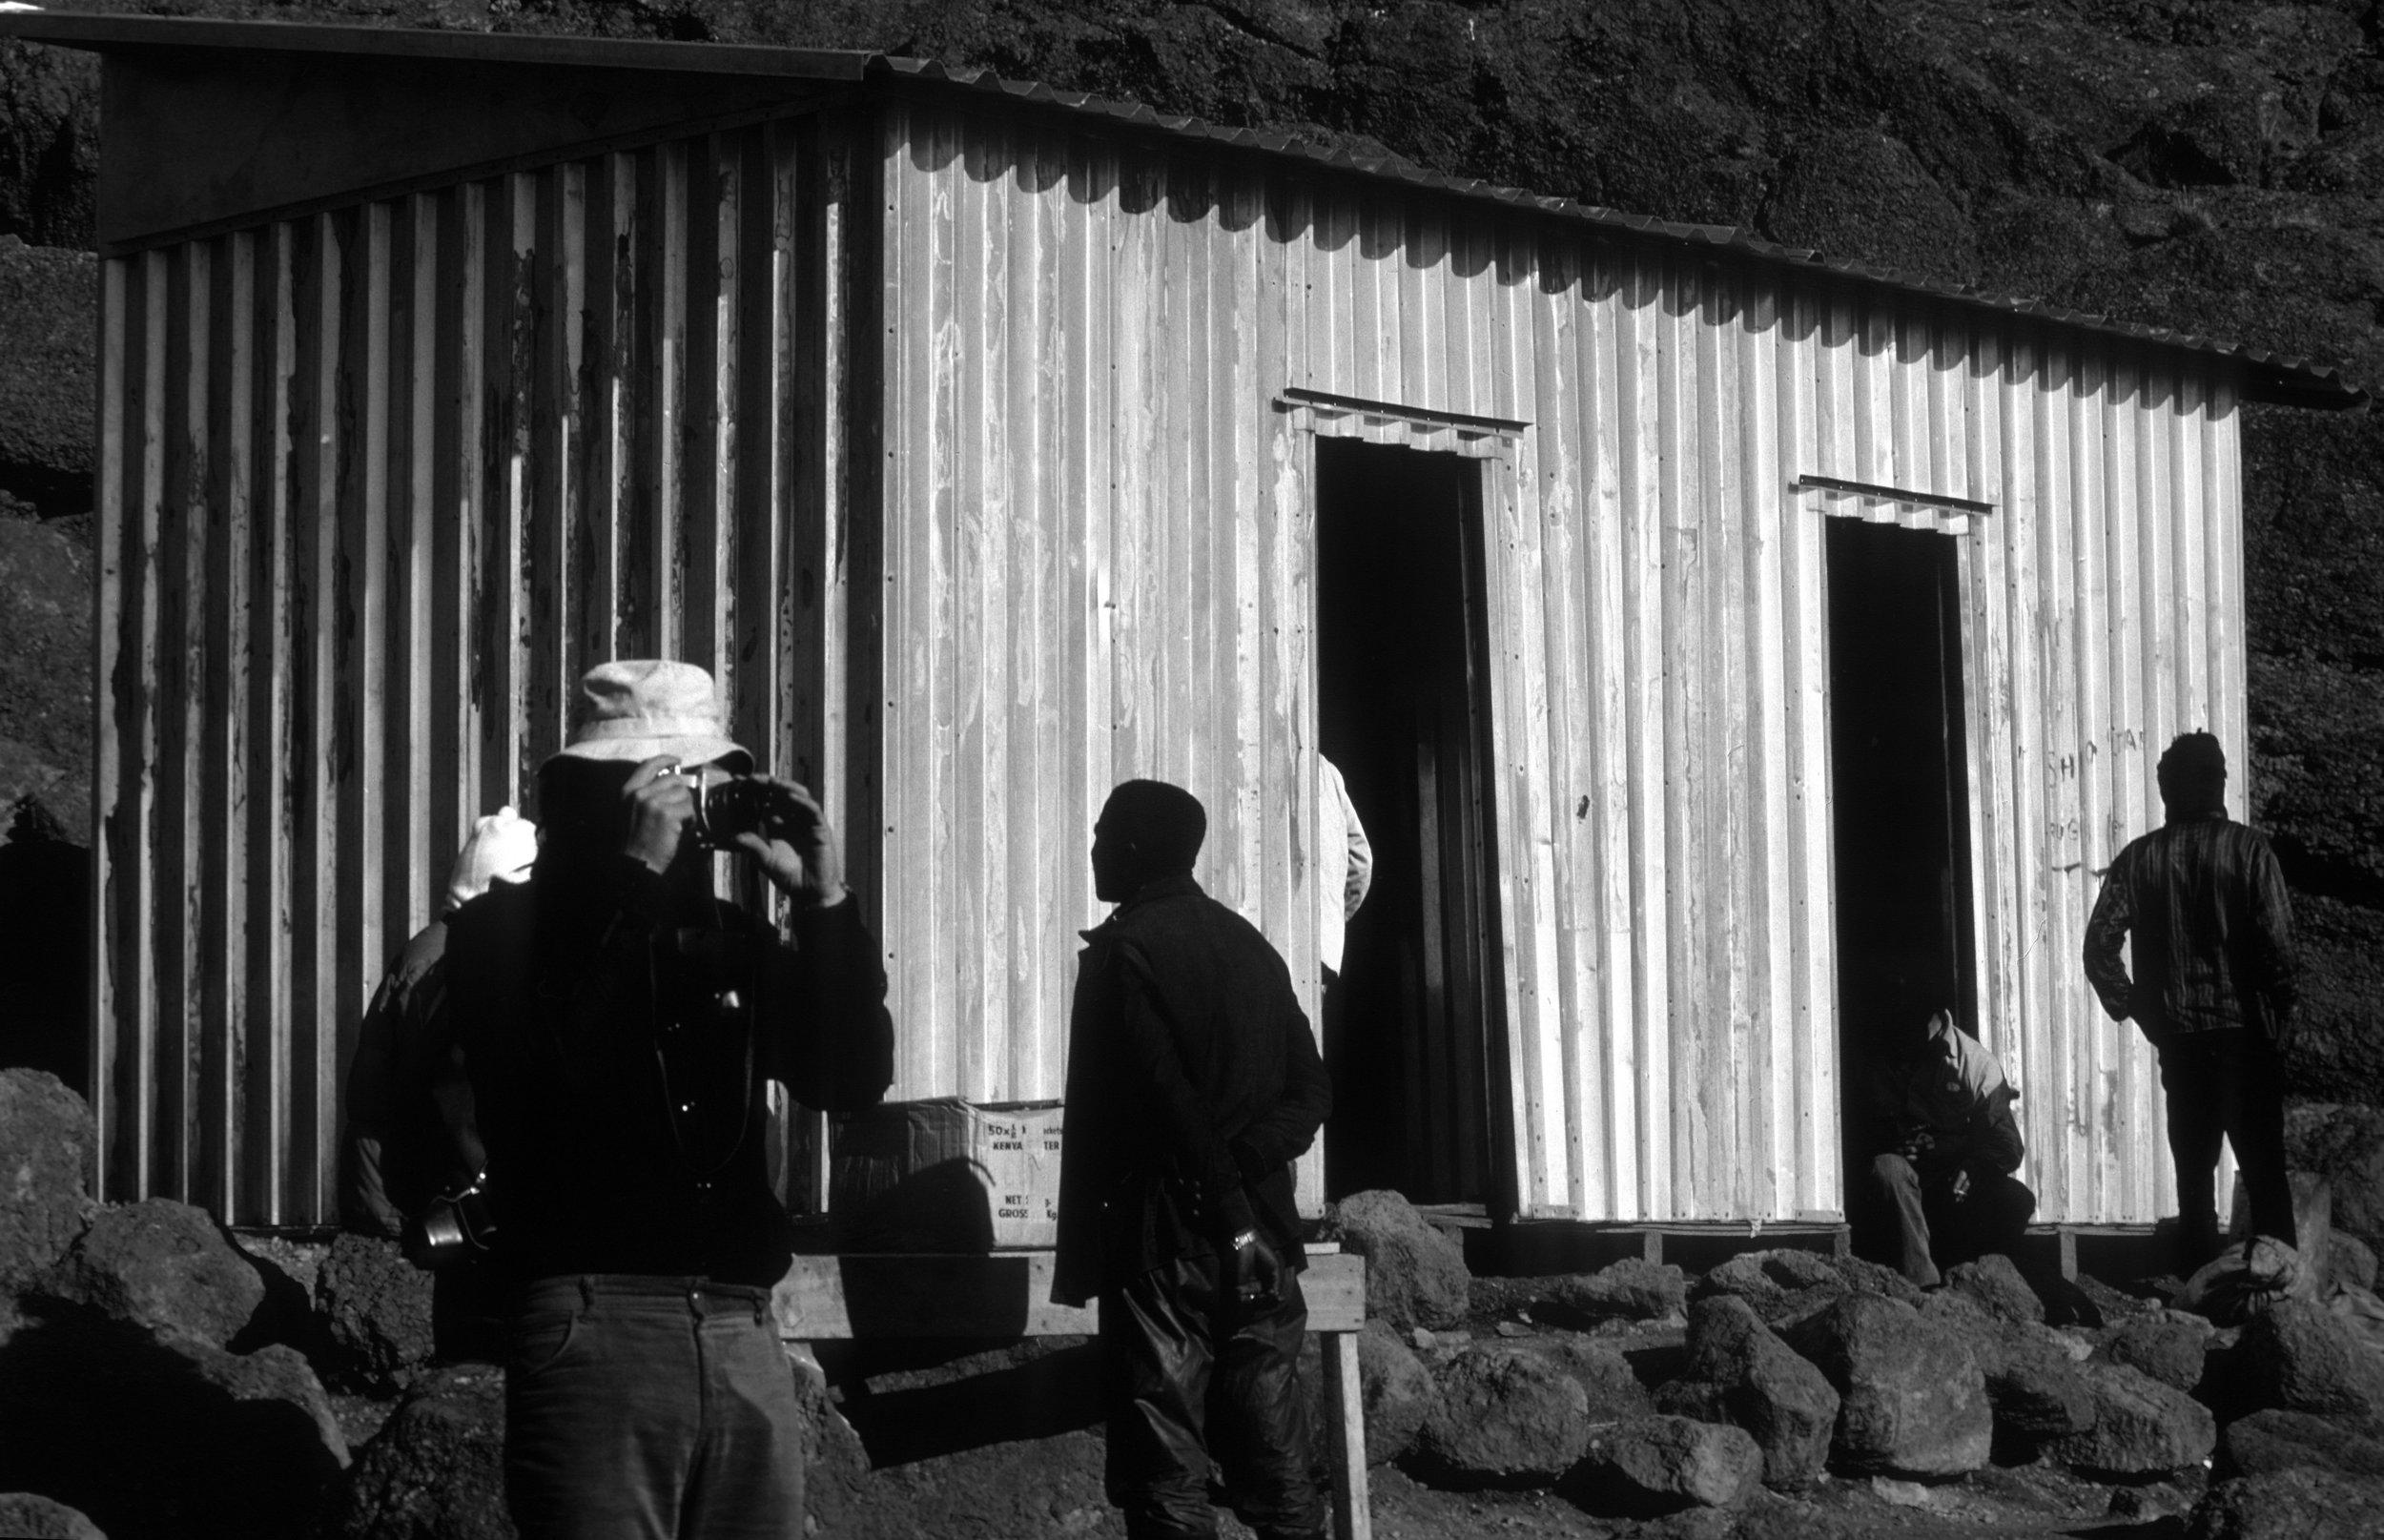 5. Corrugated metal. Old Kibo Hut at 15,520ft on Mt. Kilimanjaro. © Bill Caplan